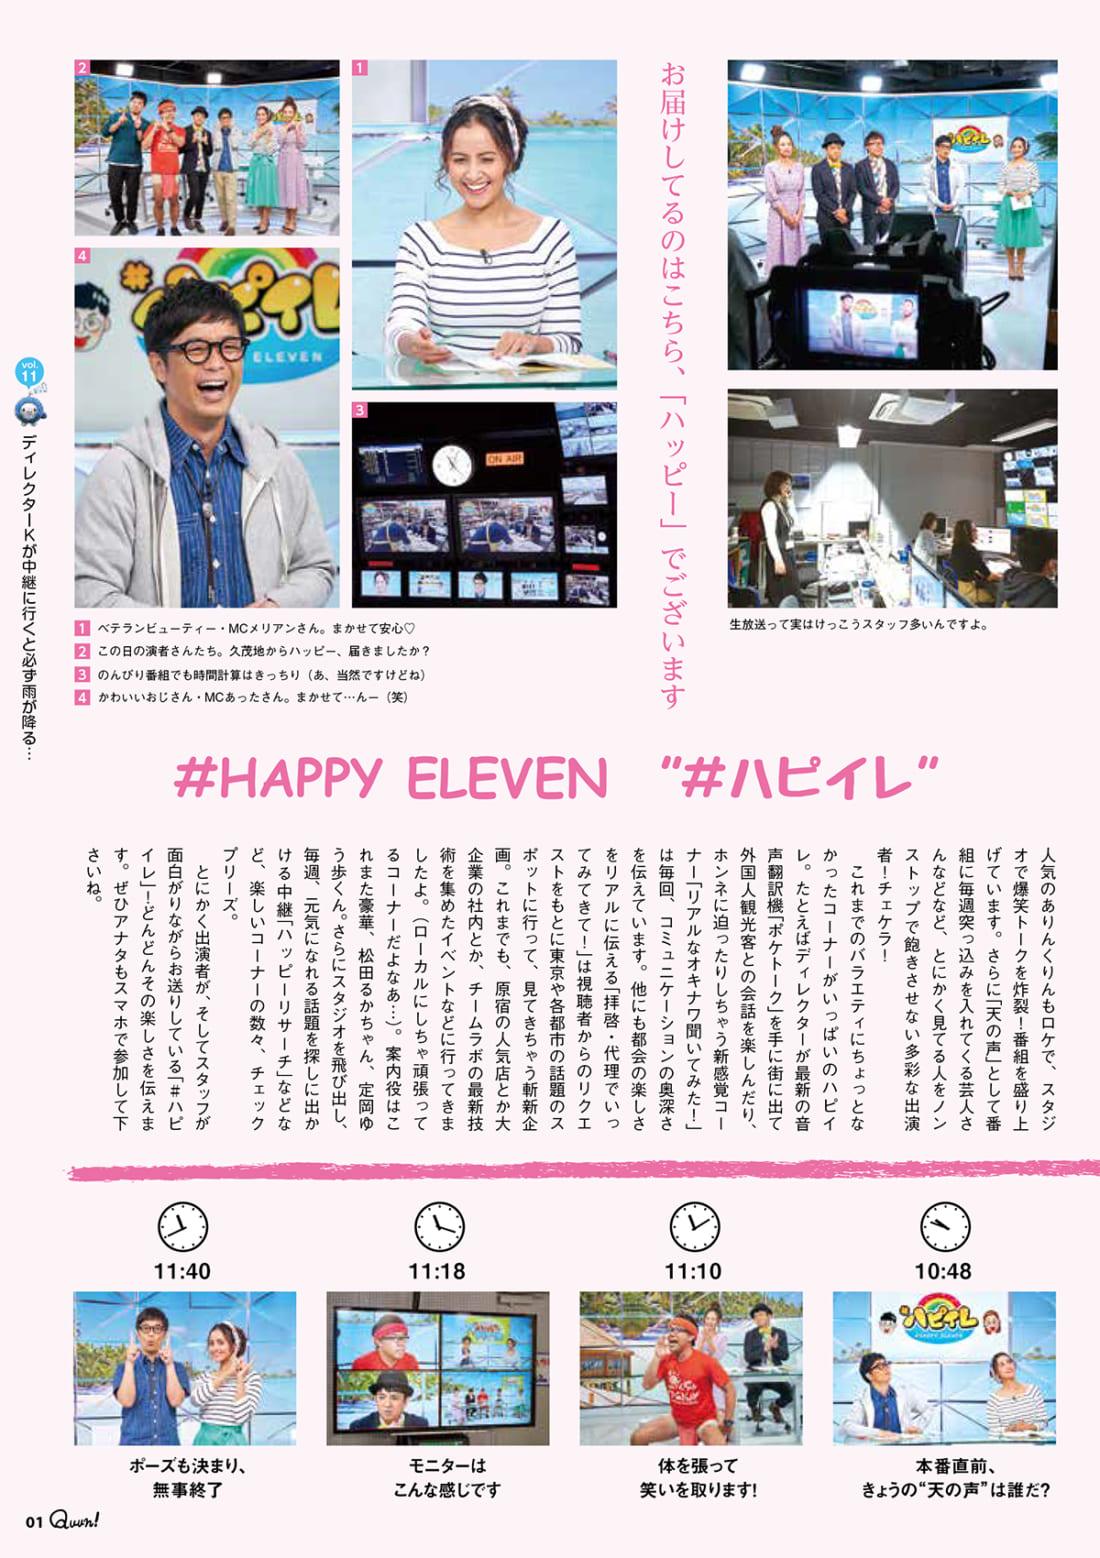 https://www.qab.co.jp/qgoro/wp-content/uploads/quun_1103-1100x1558.jpg